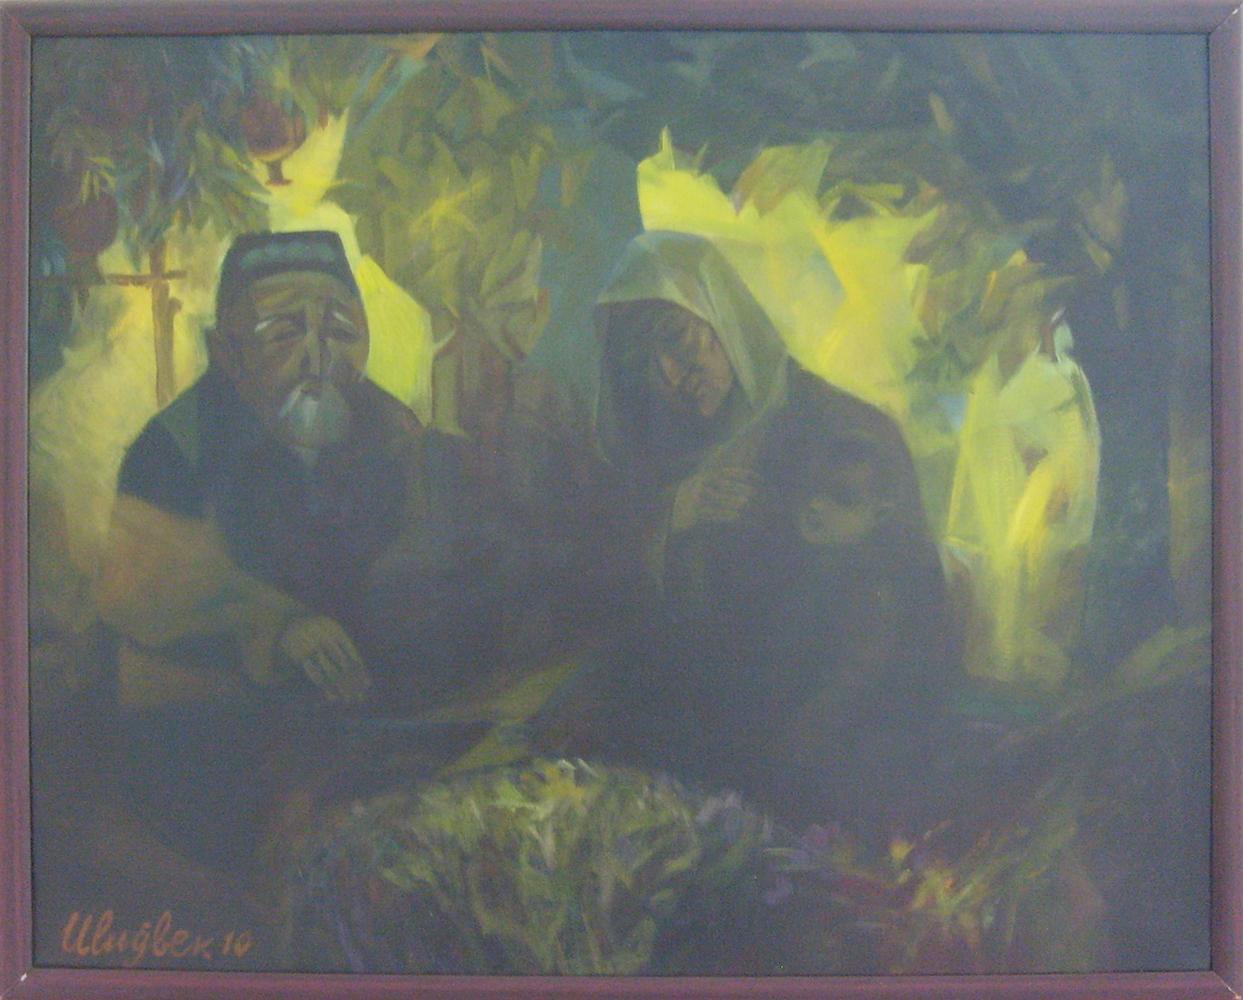 Болтабаев Улугбек. Запах базилика